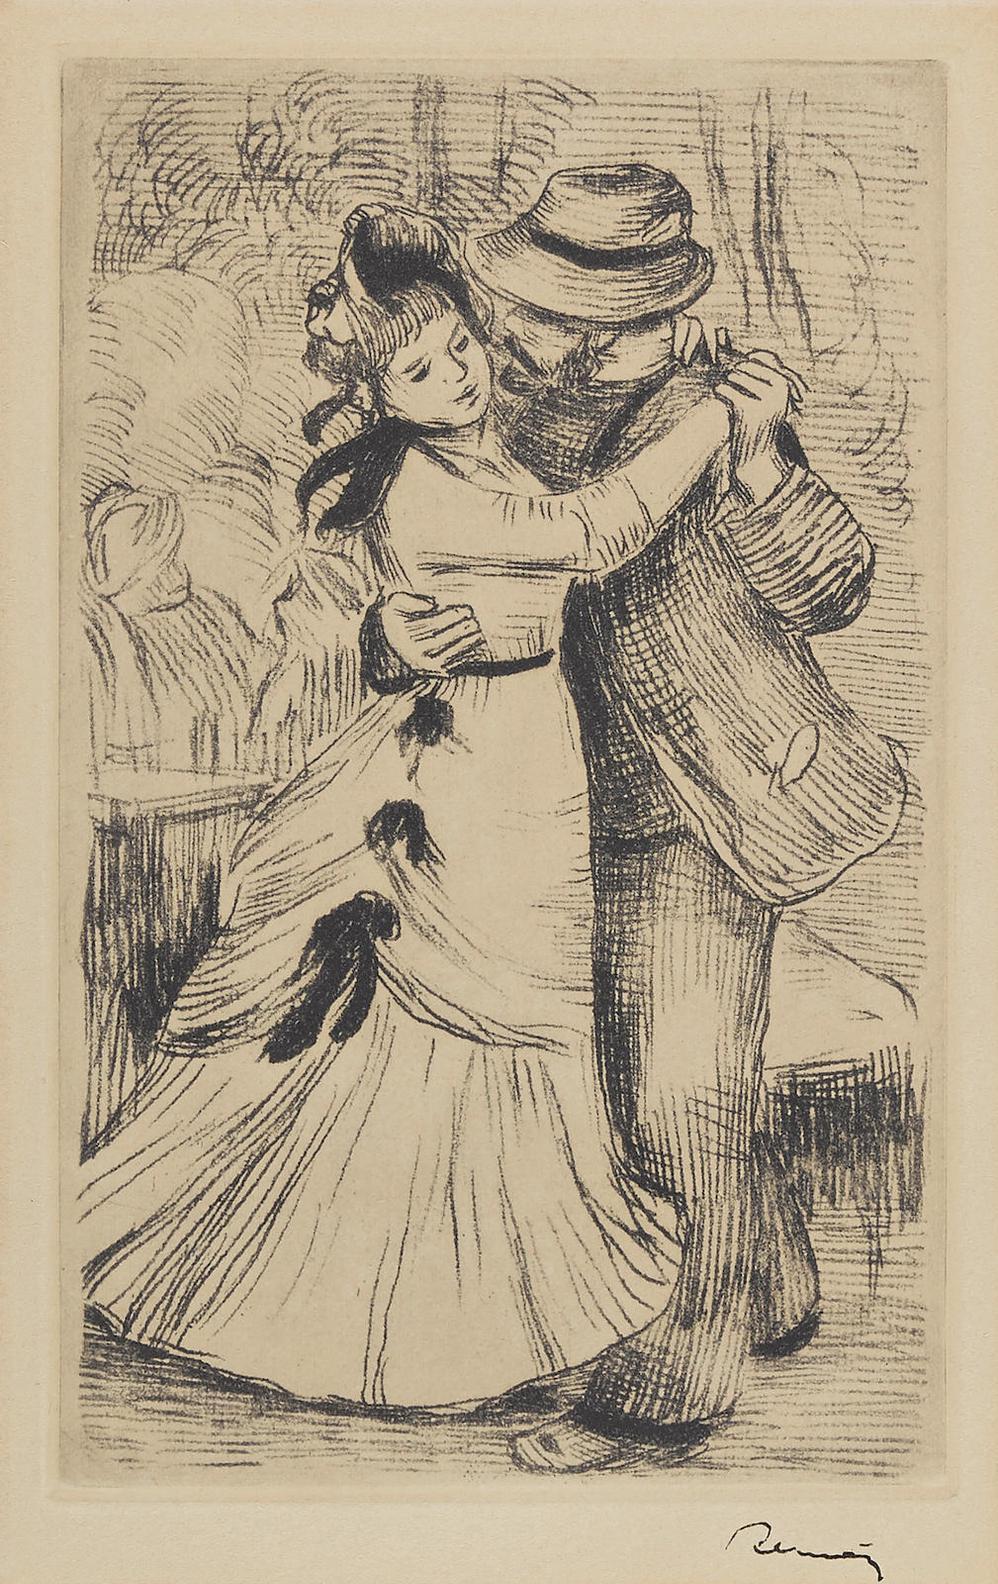 Pierre-Auguste Renoir-La Danse A La Campagne, 2E Planche-1890